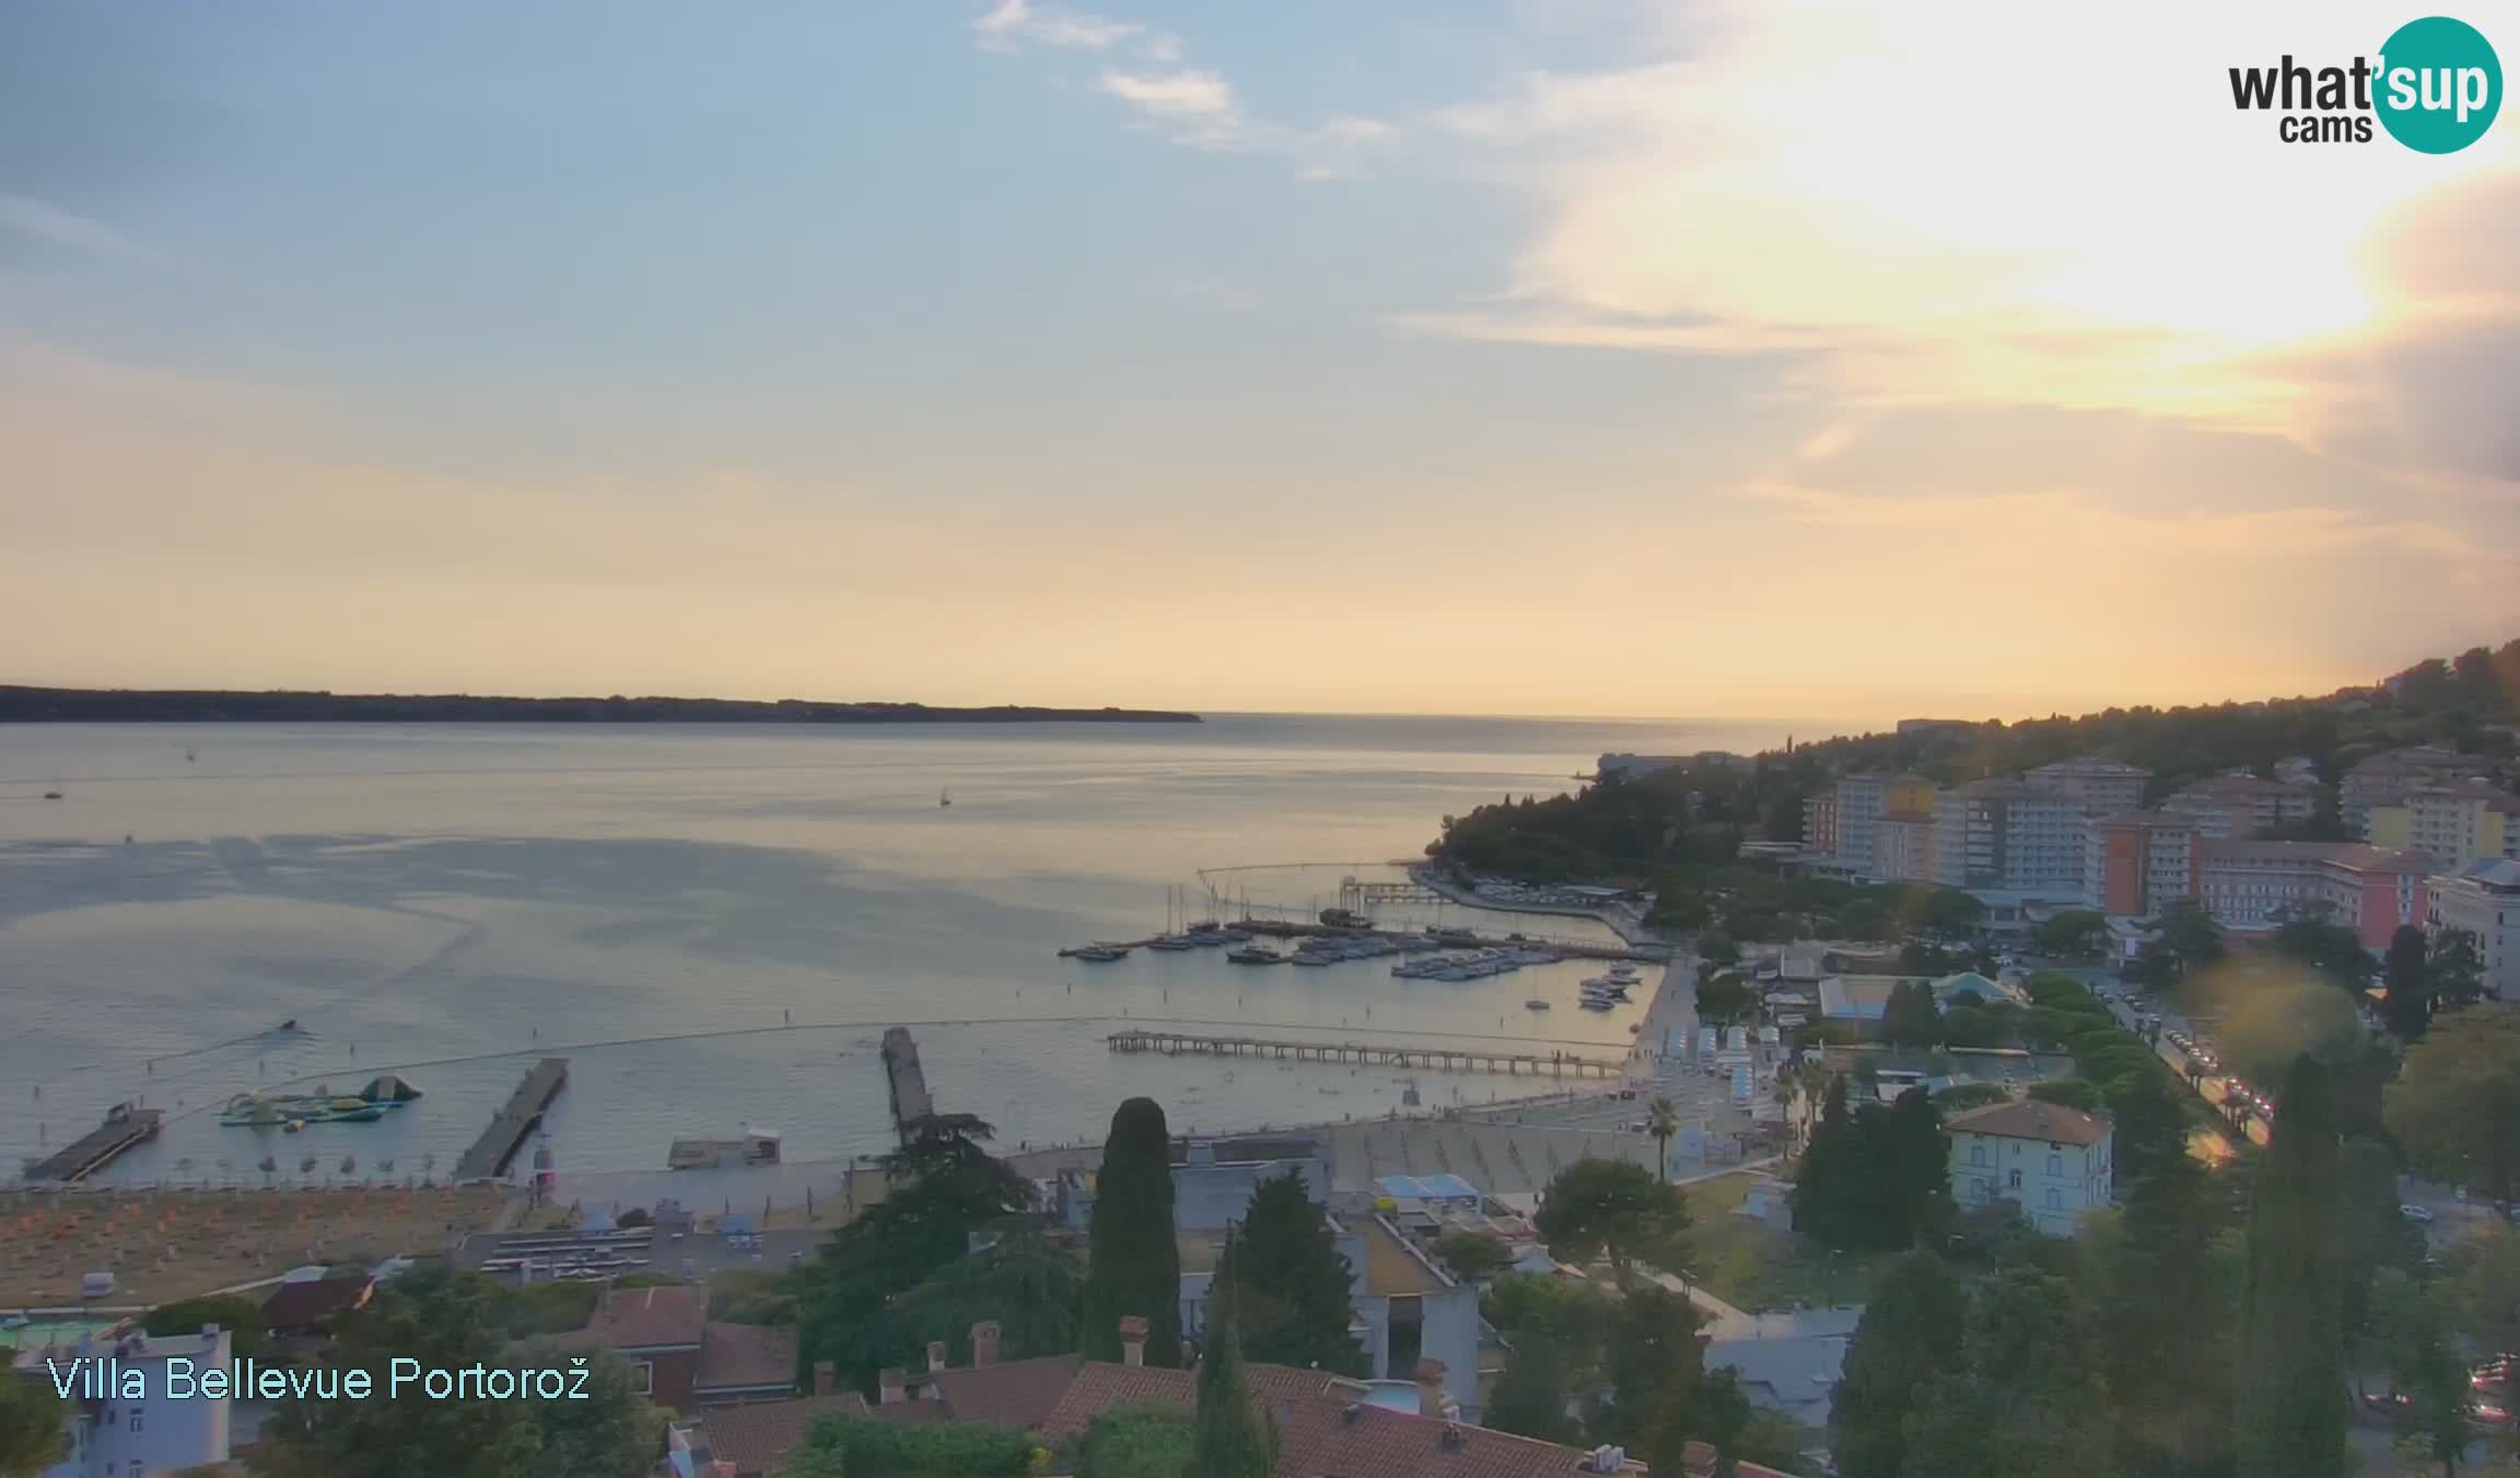 Portorož Sun. 19:35